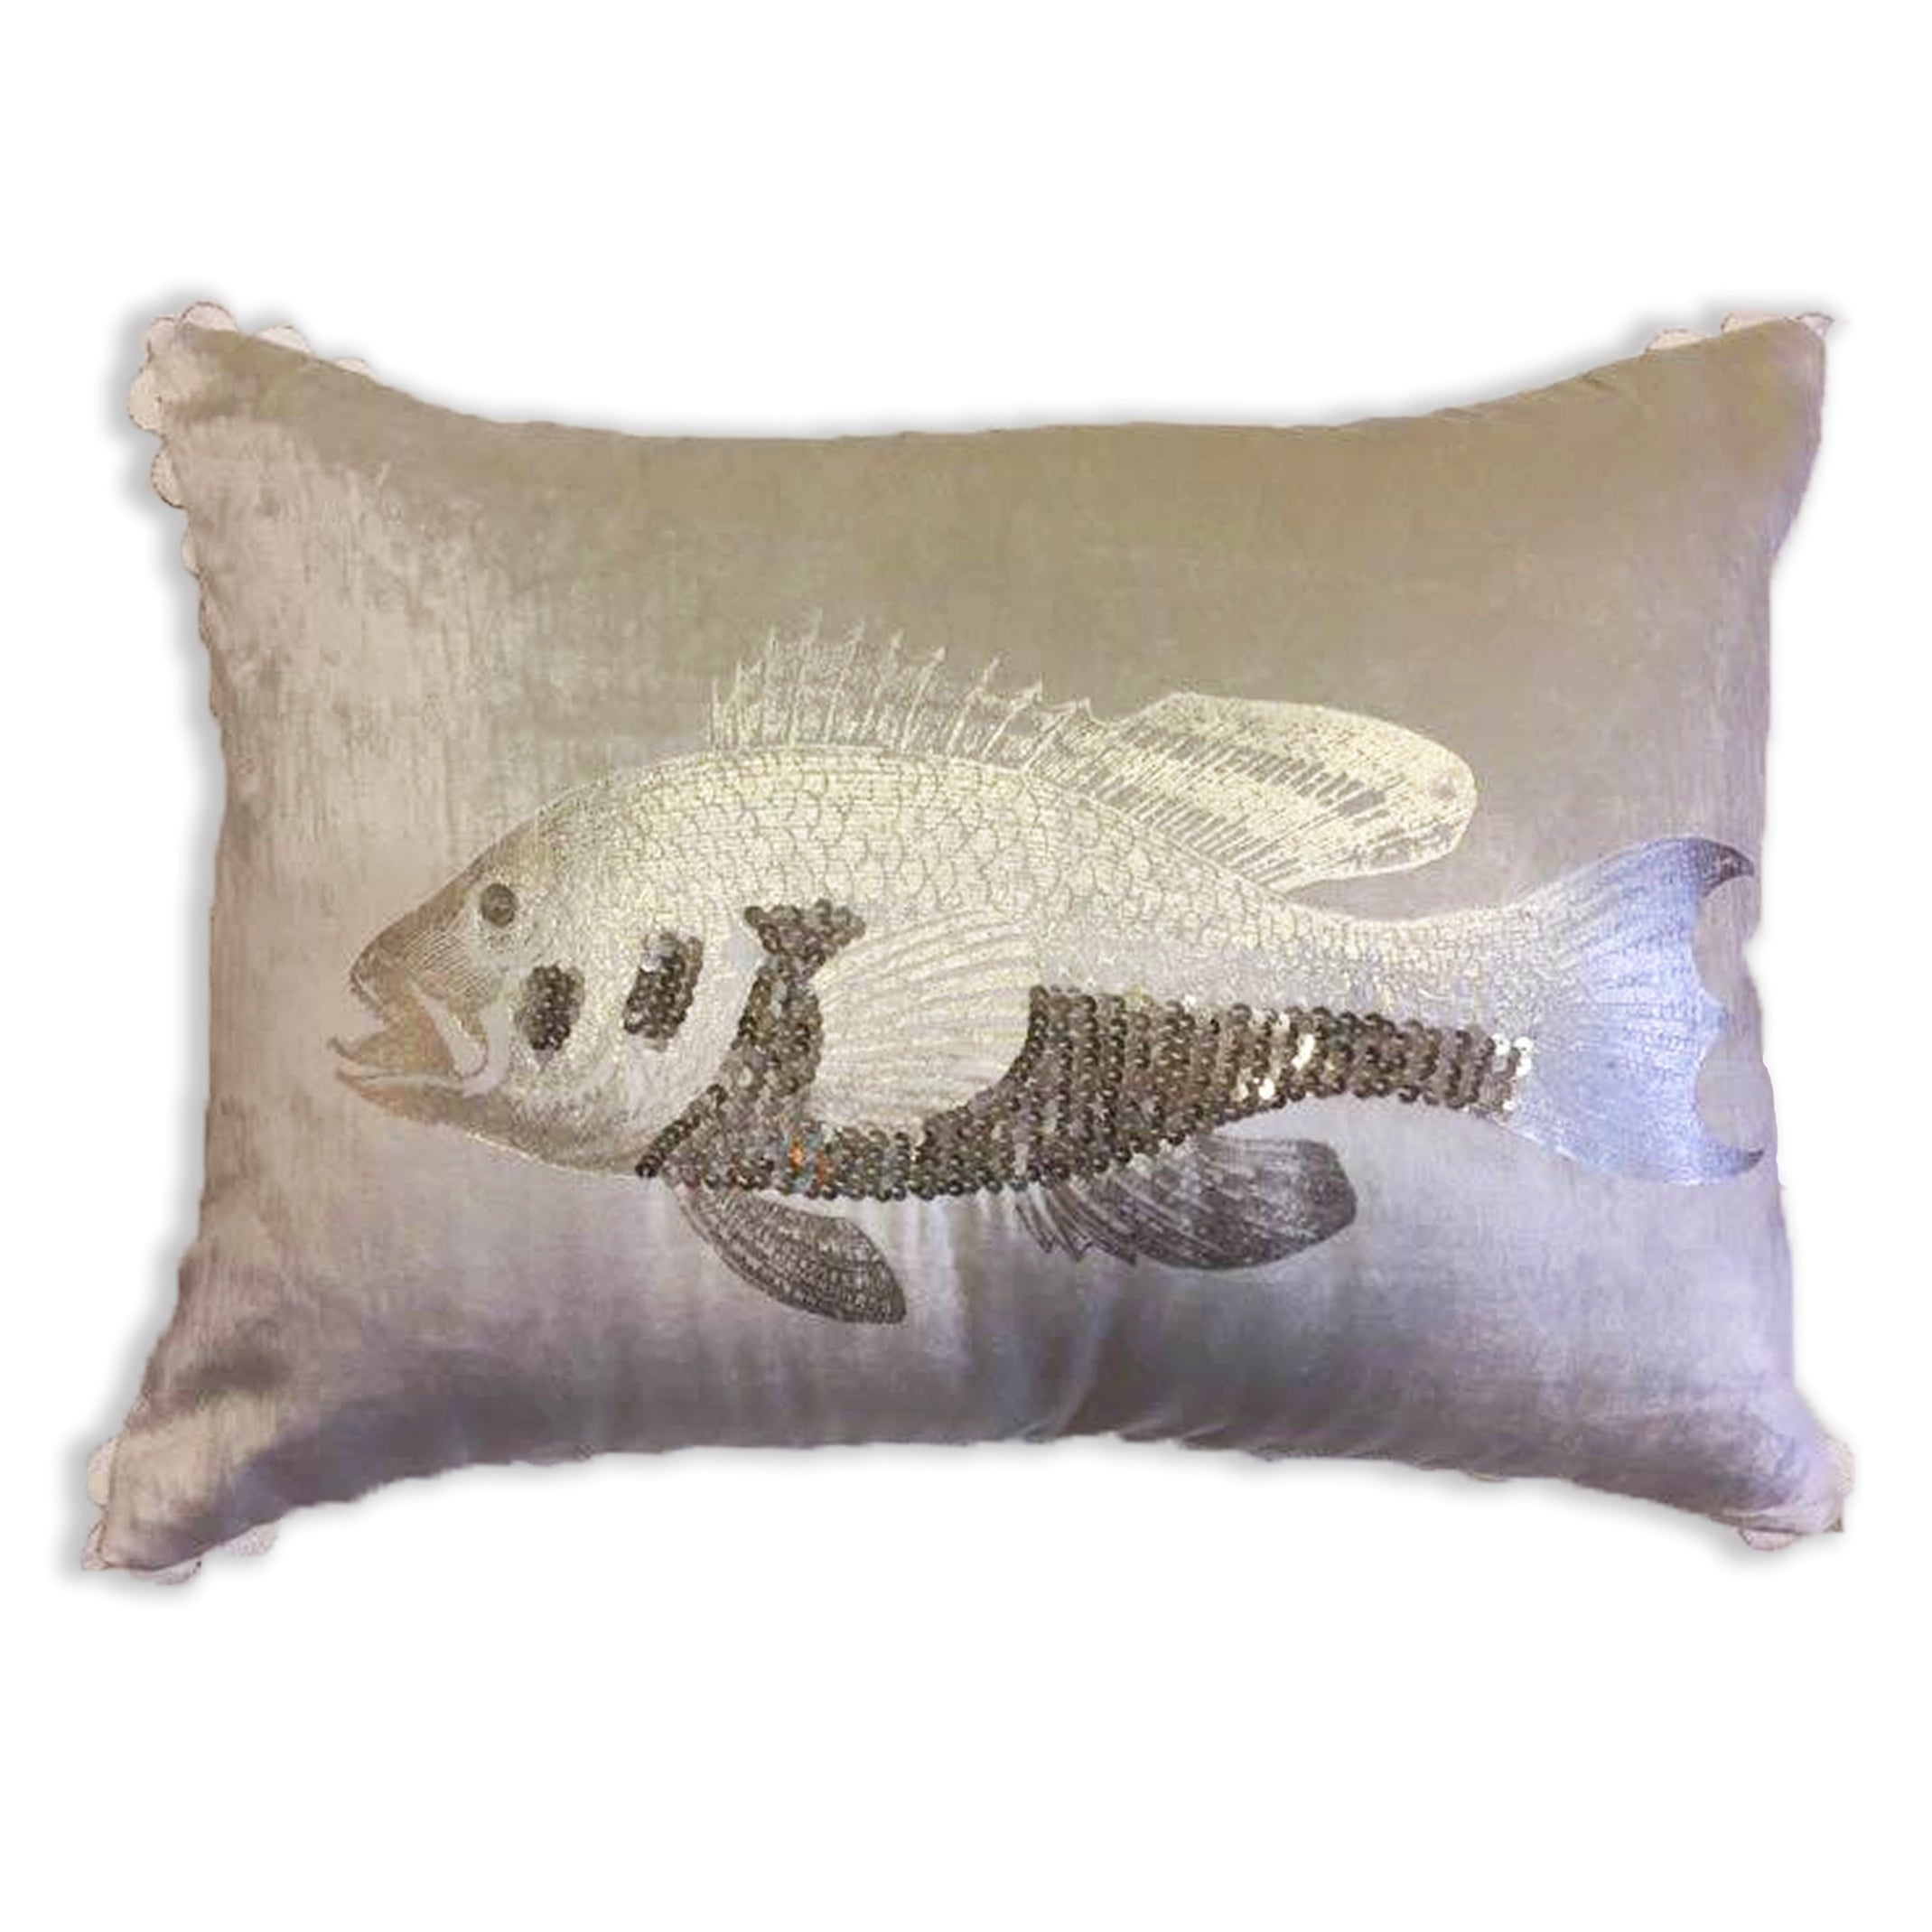 Gold Fish Decorative Pillow